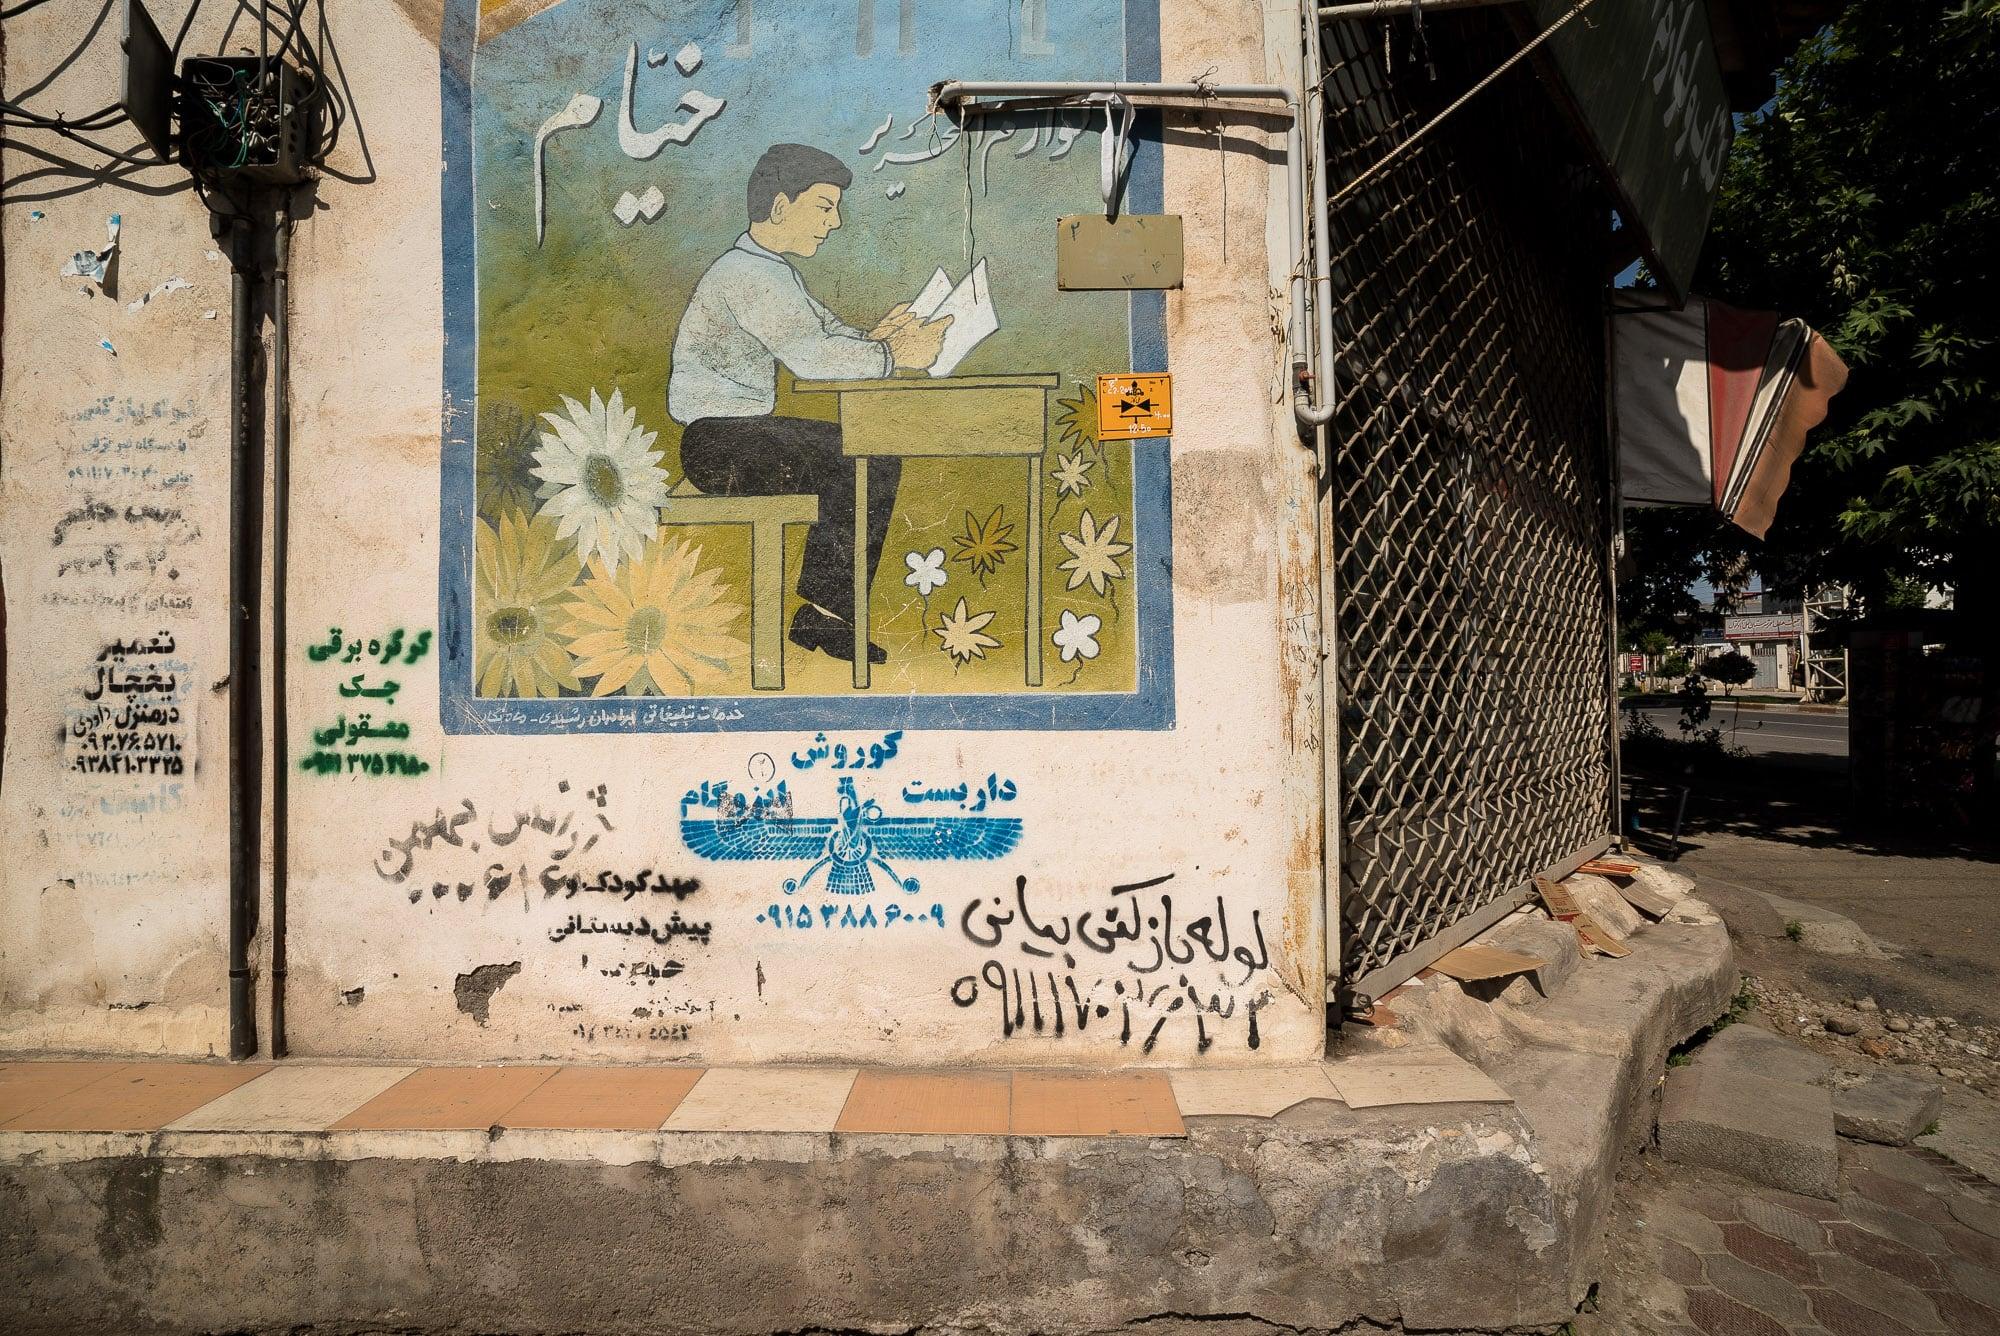 Propaganda mural and a Zoroastrian logo